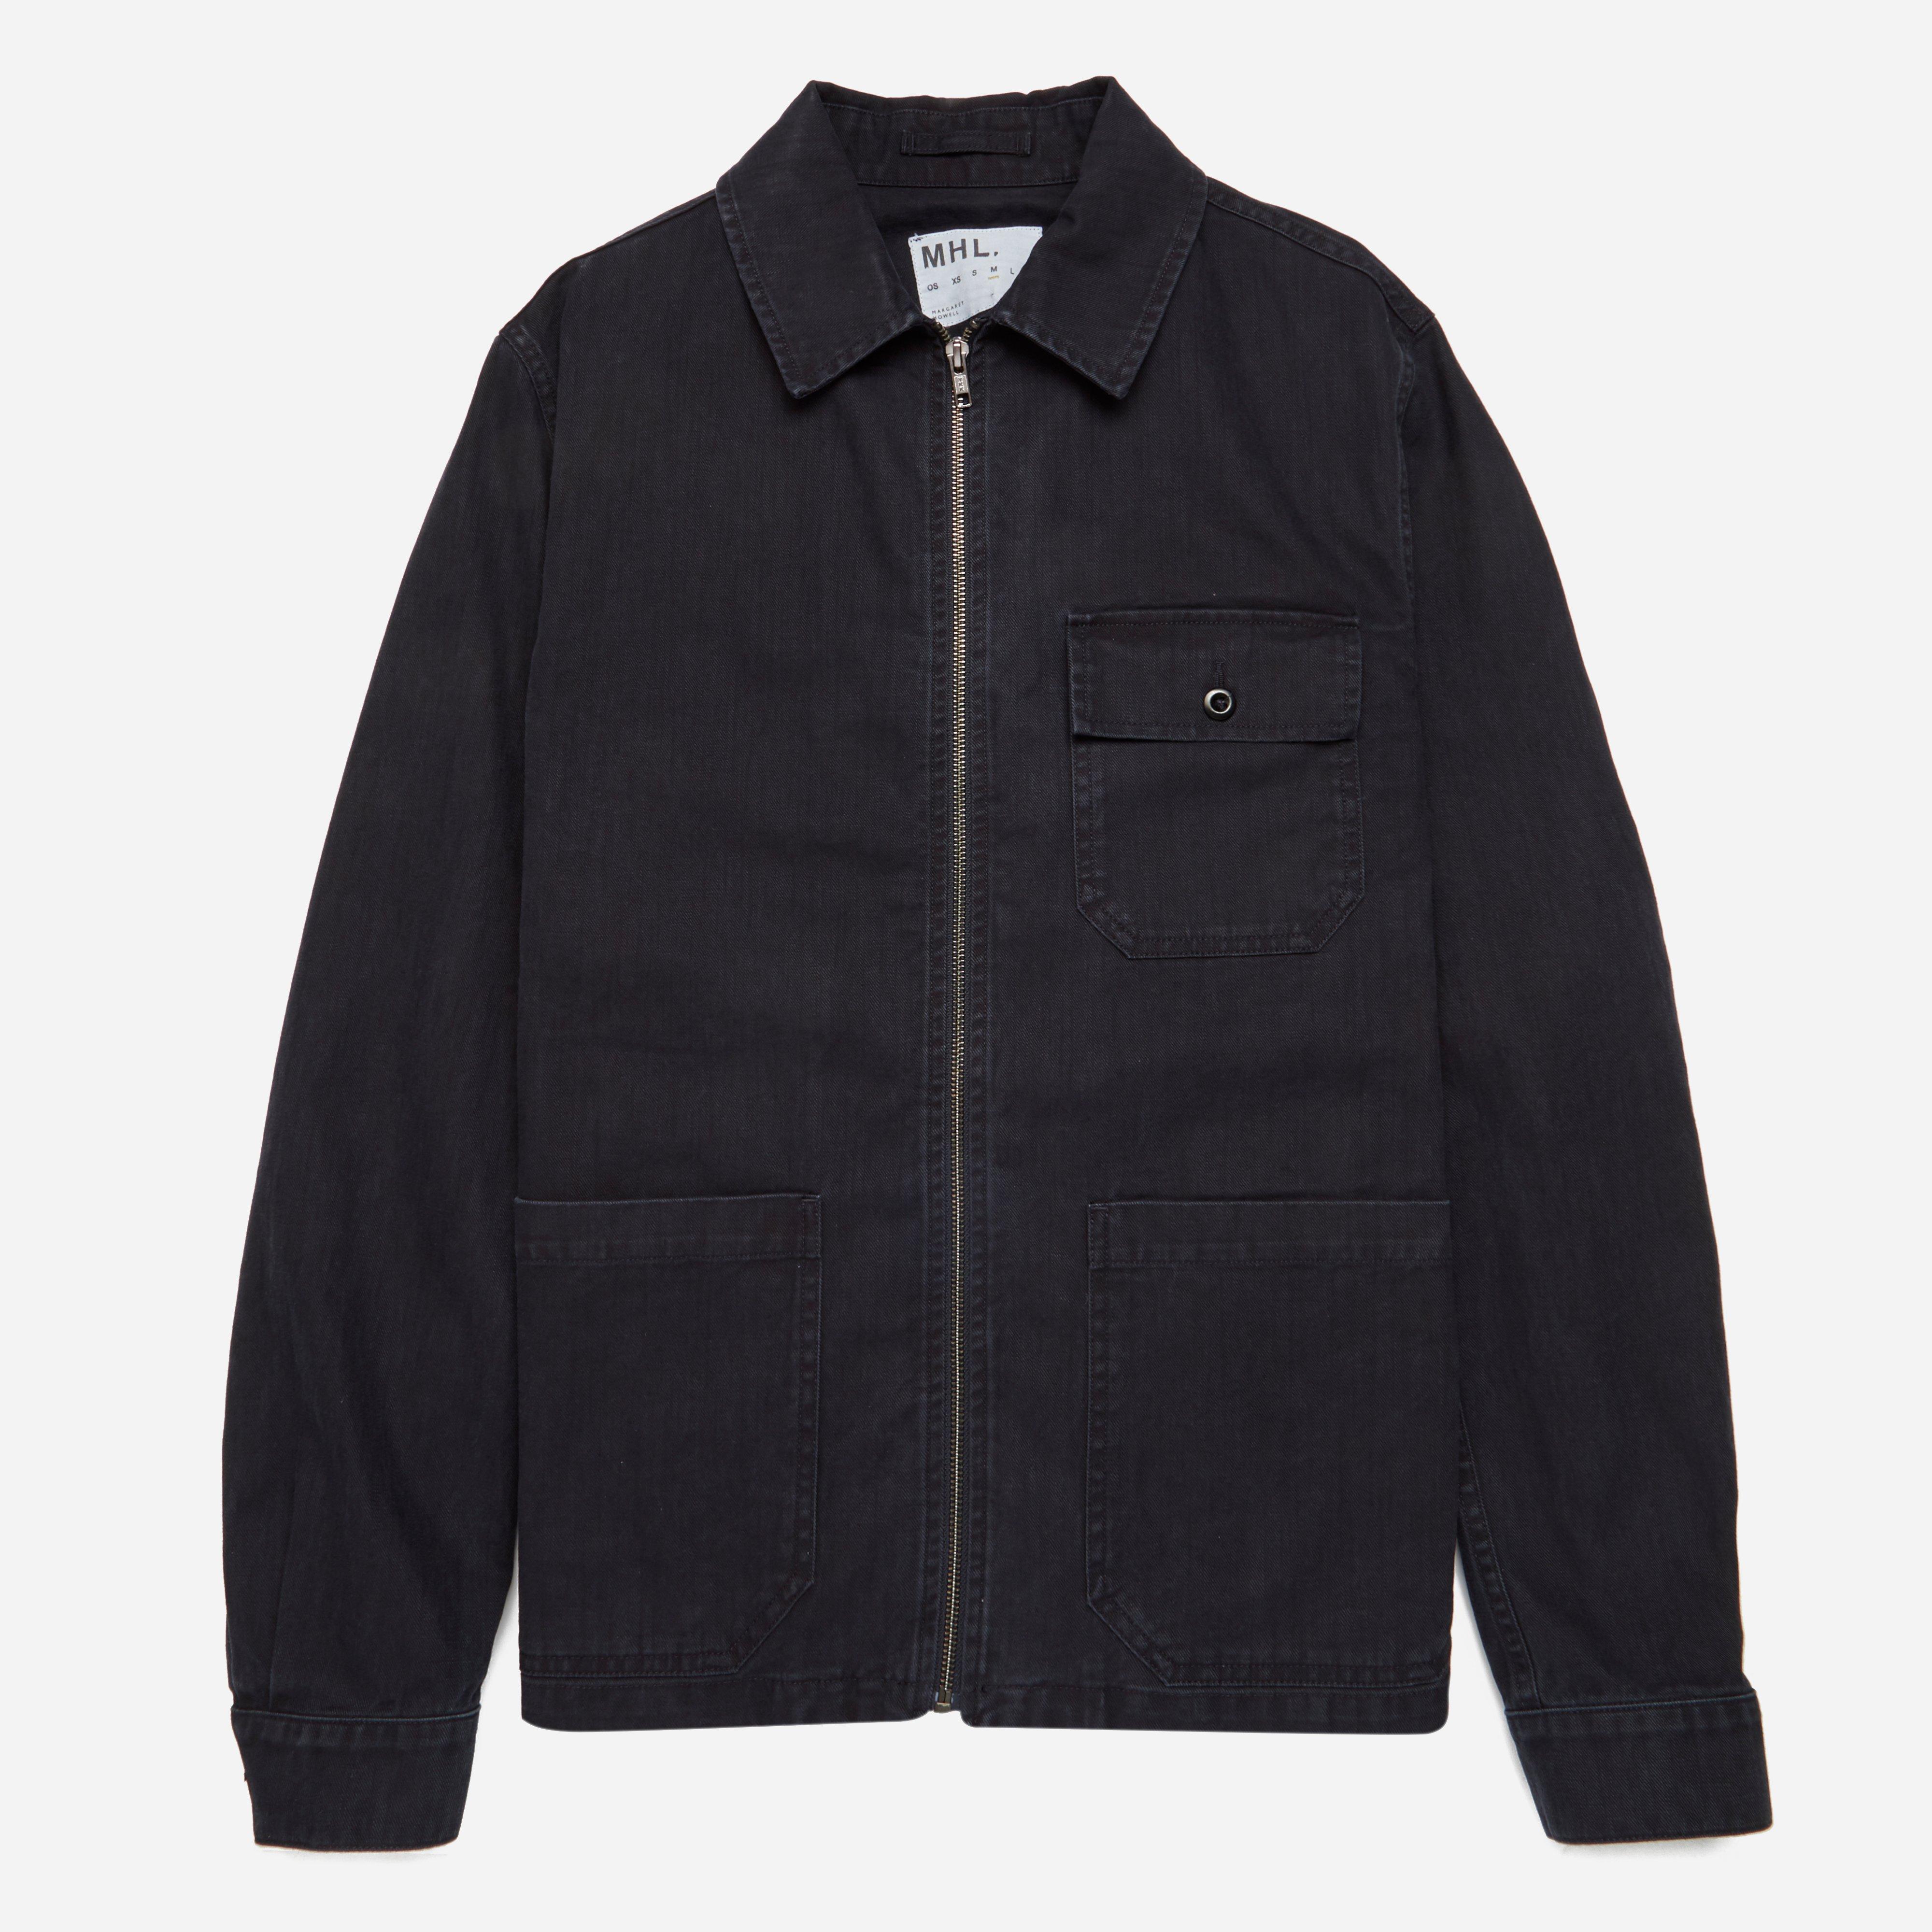 MHL Indigo Twill Side Adjustor Jacket